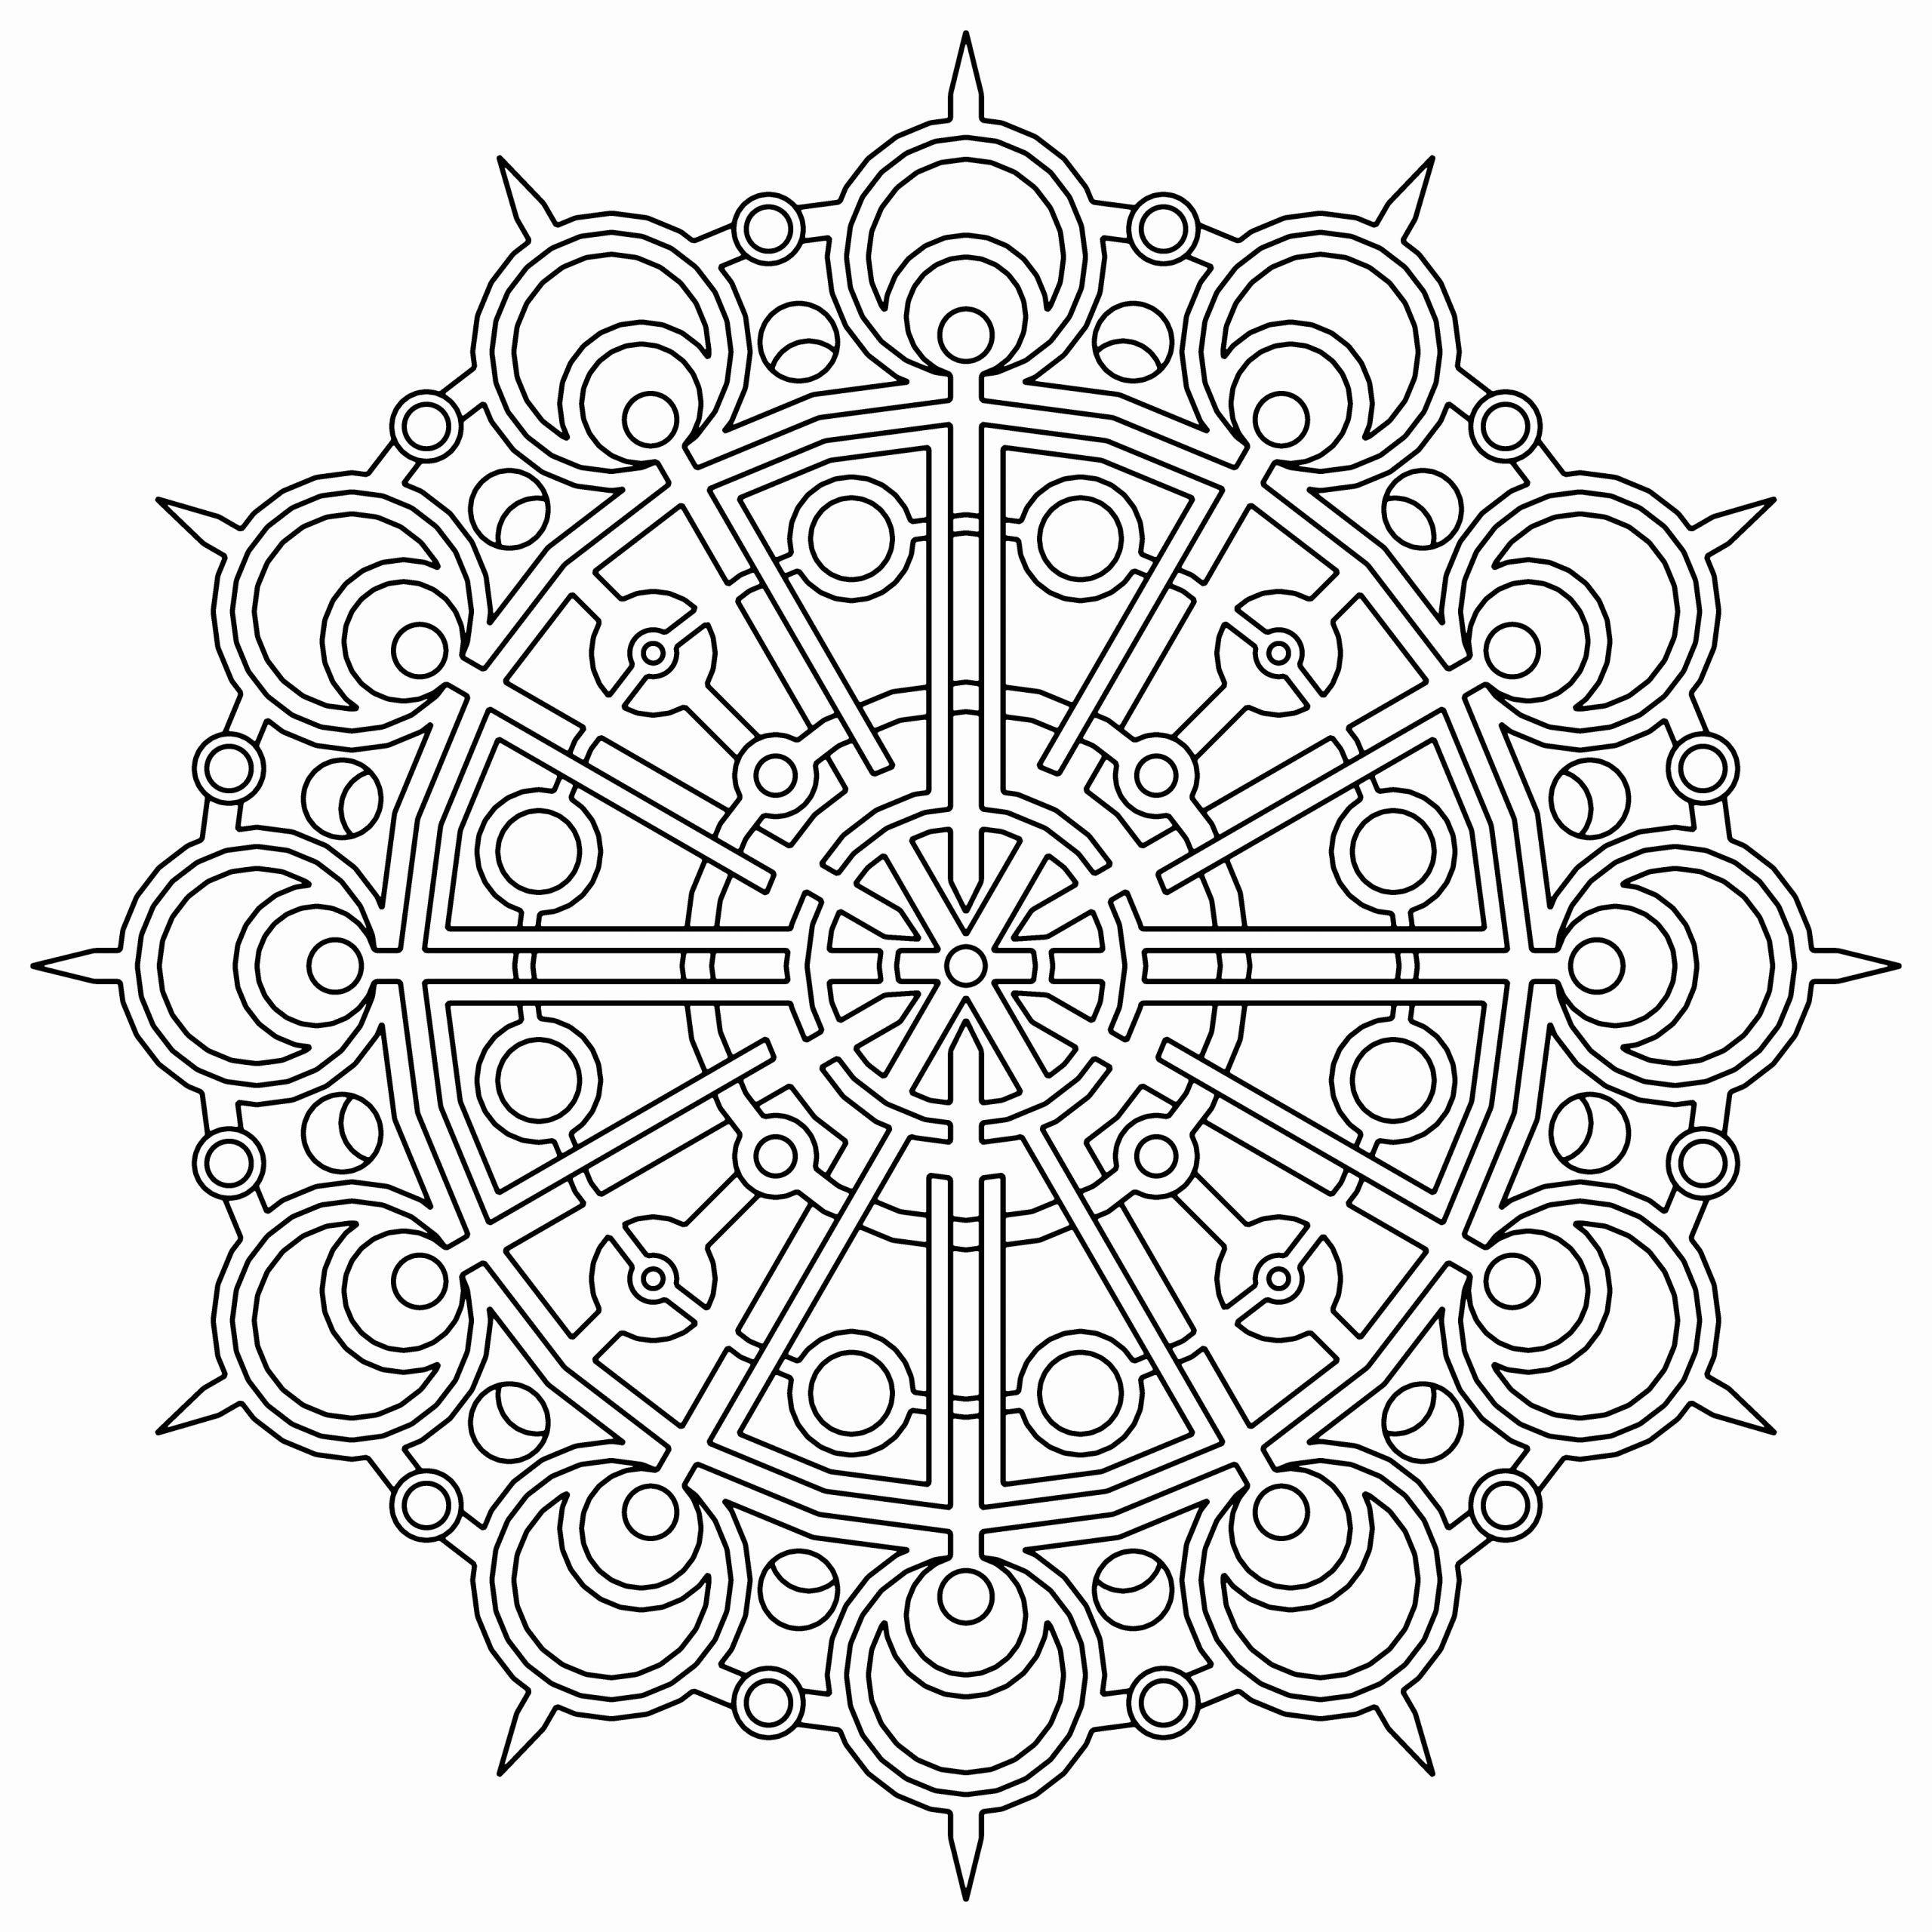 Geometric Coloring Books Luxury Free Printable Geometric Coloring Pages For Kids In 2020 Geometric Coloring Pages Mandala Coloring Pages Mandala Coloring Books